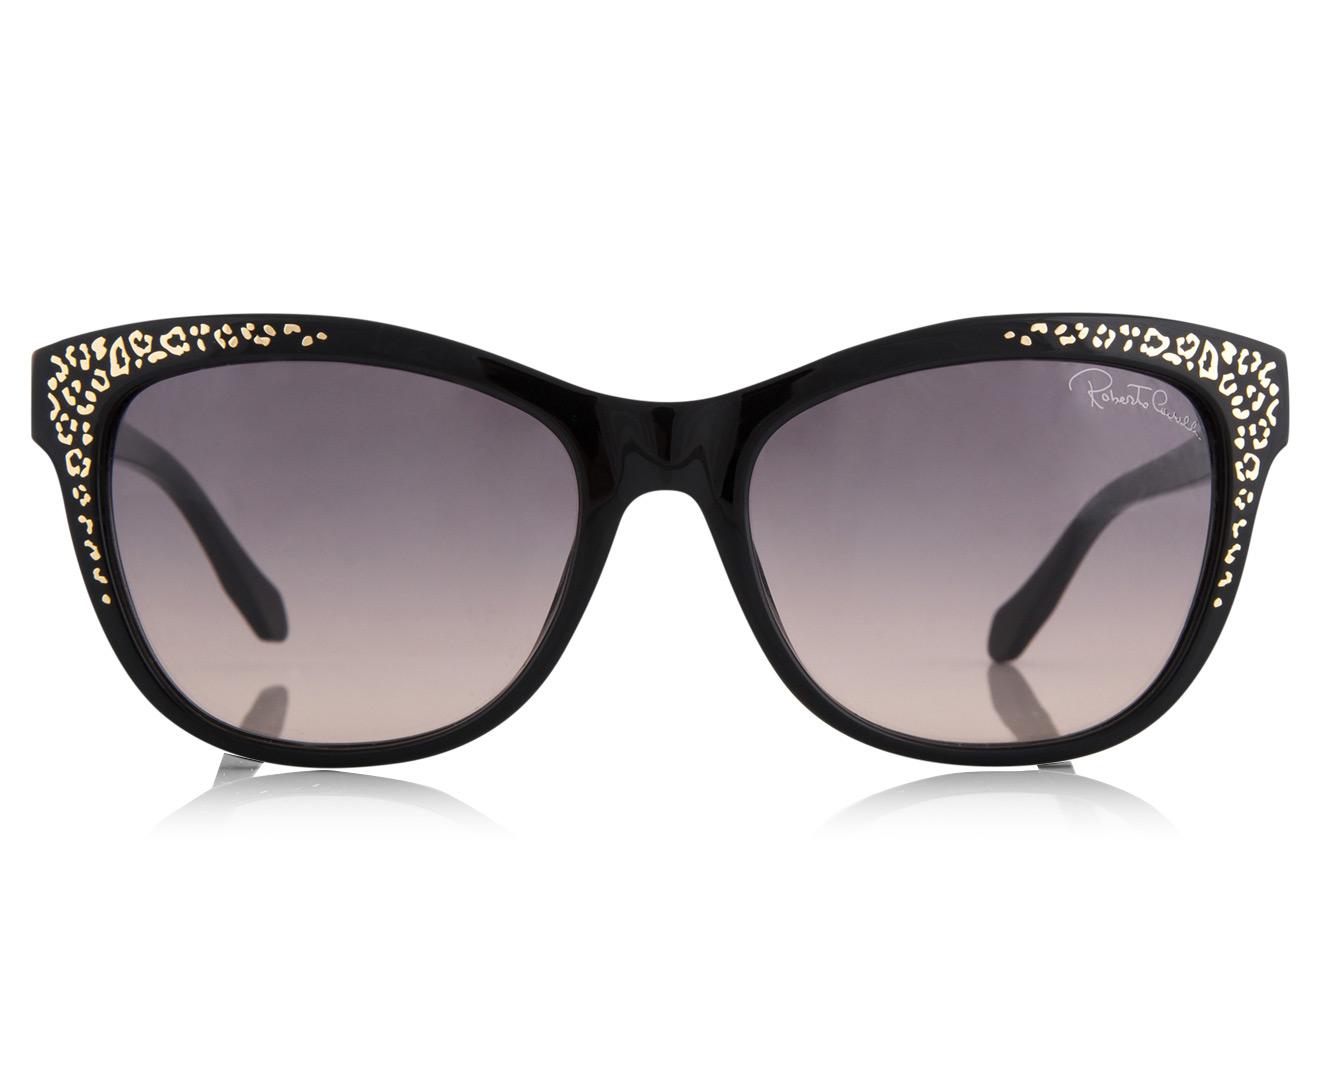 6afde076570e5 Roberto Cavalli Sunglasses Rea Wayfarer Year   Louisiana Bucket Brigade